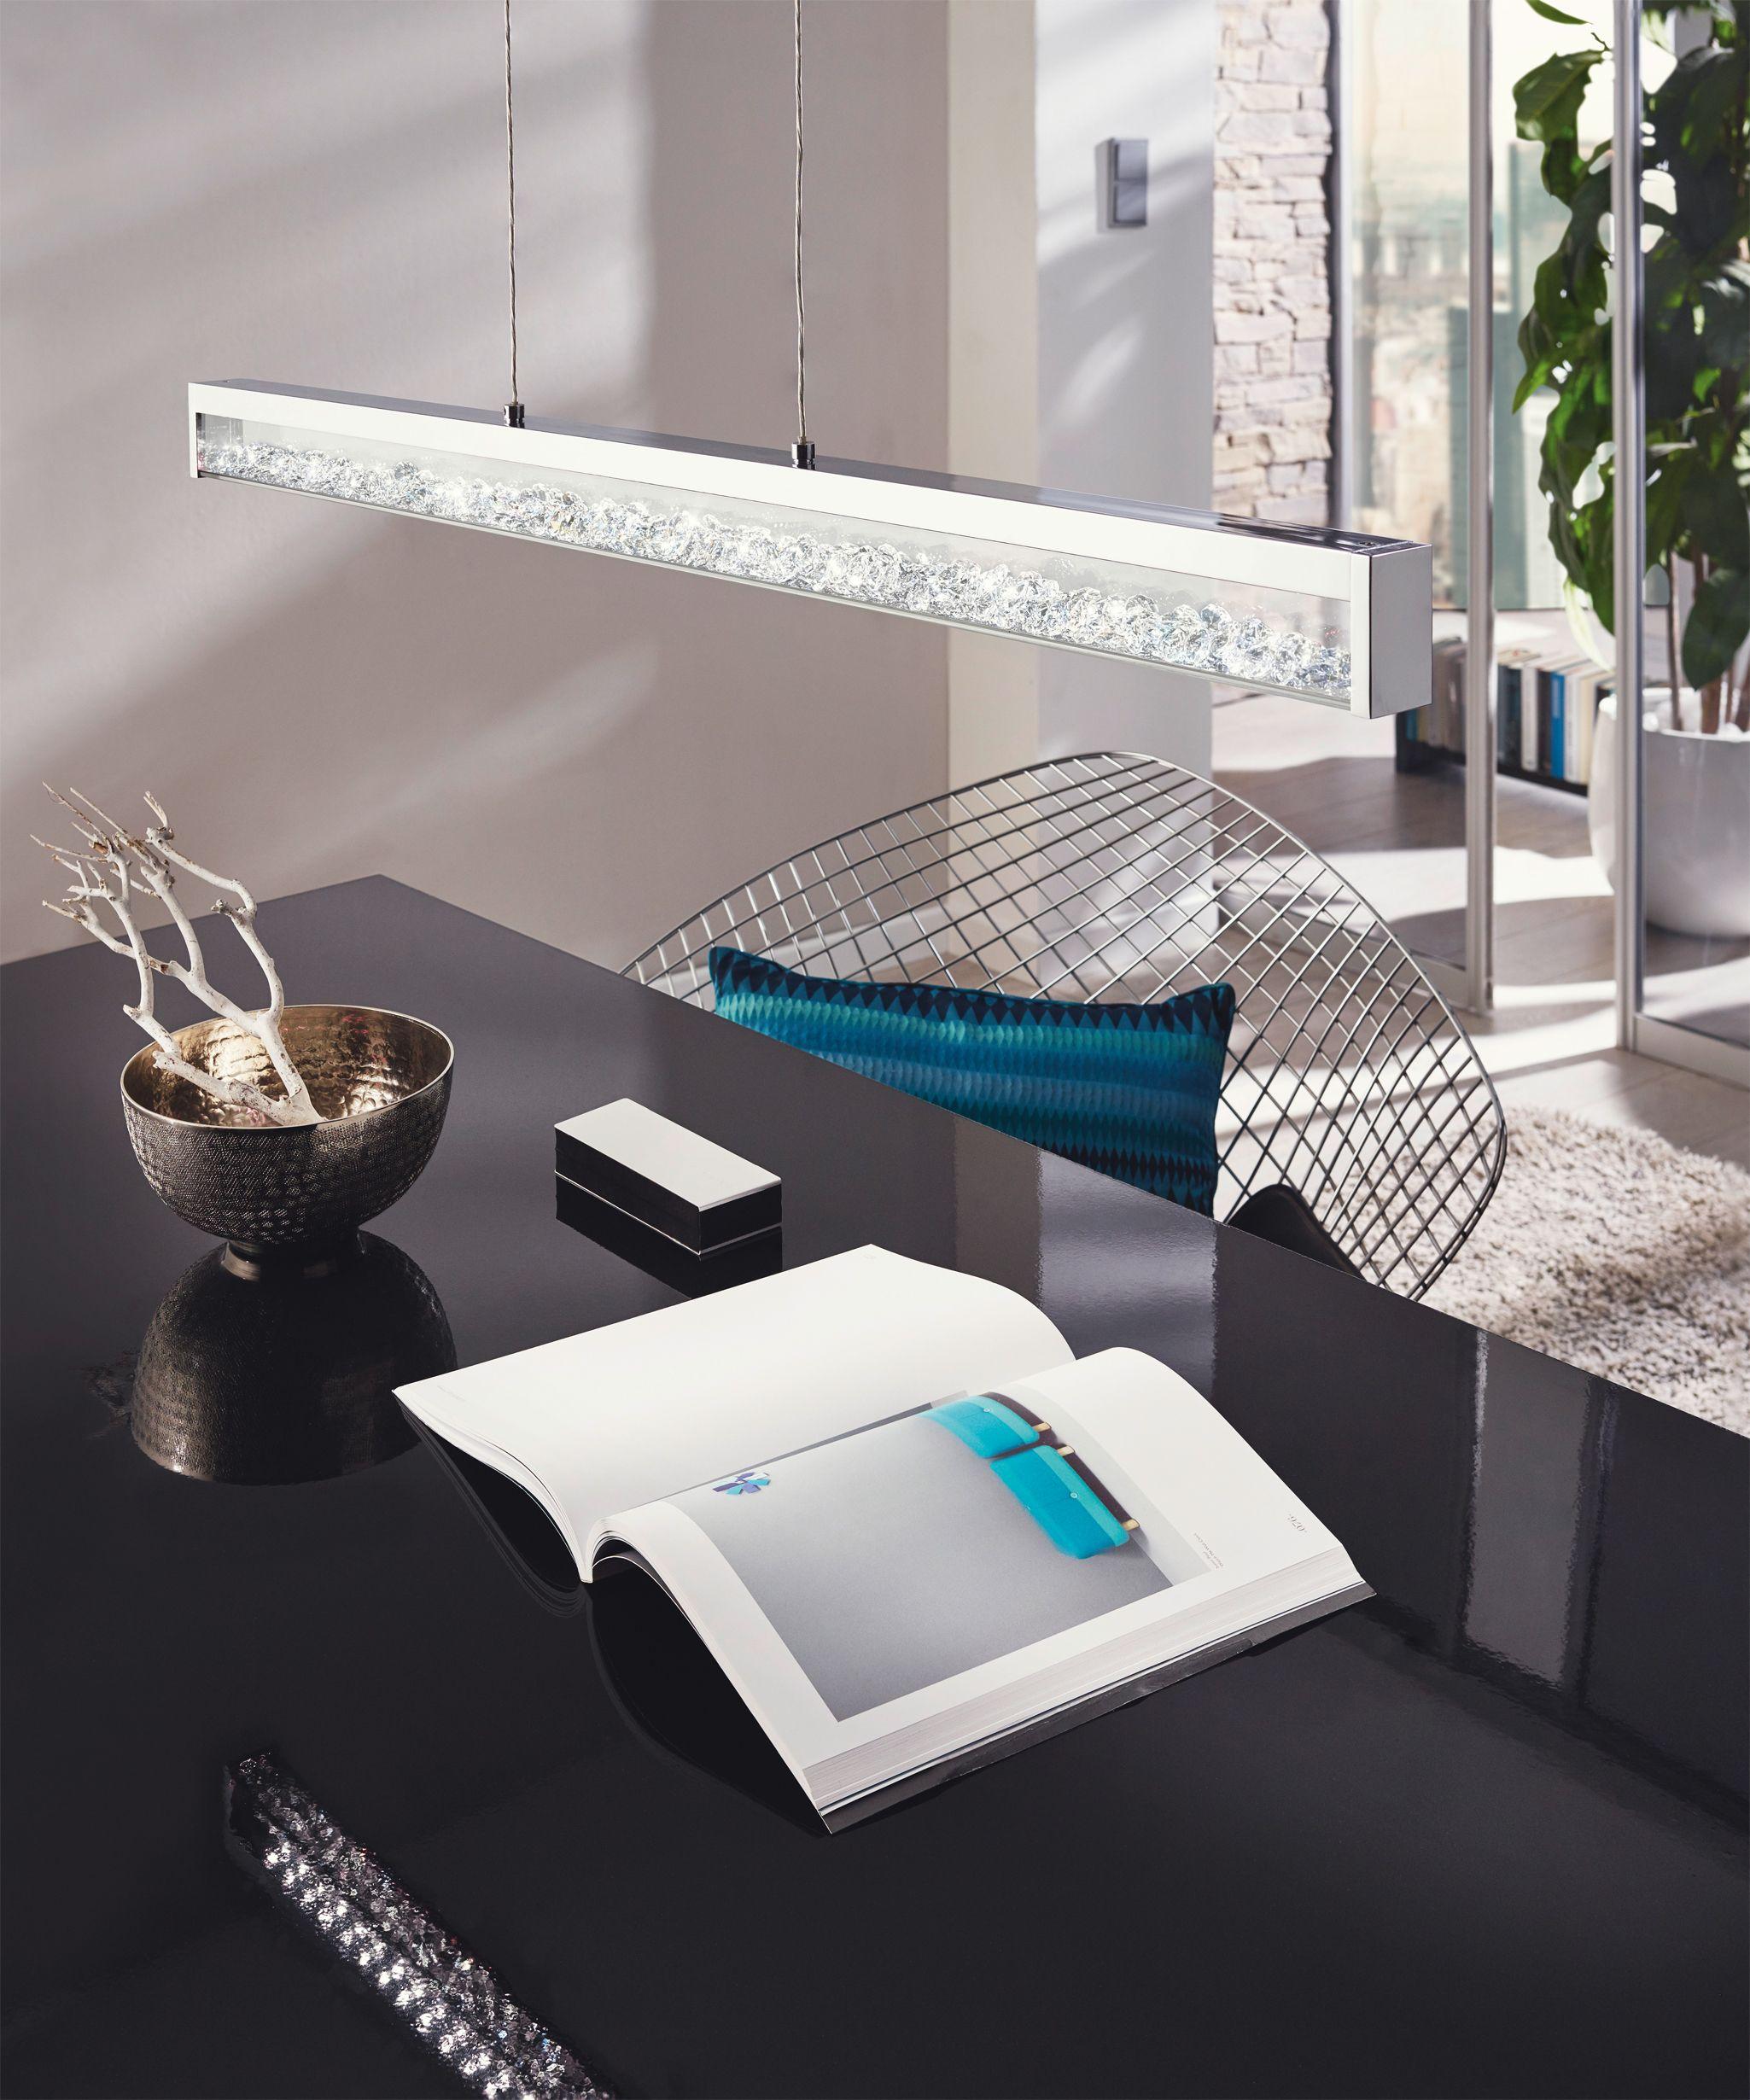 crystal pendant lighting for kitchen. Eglo Lighting / Cardito Glass \u0026 Crystal LED Modern Pendant Light With Chrome Finish For Kitchen T